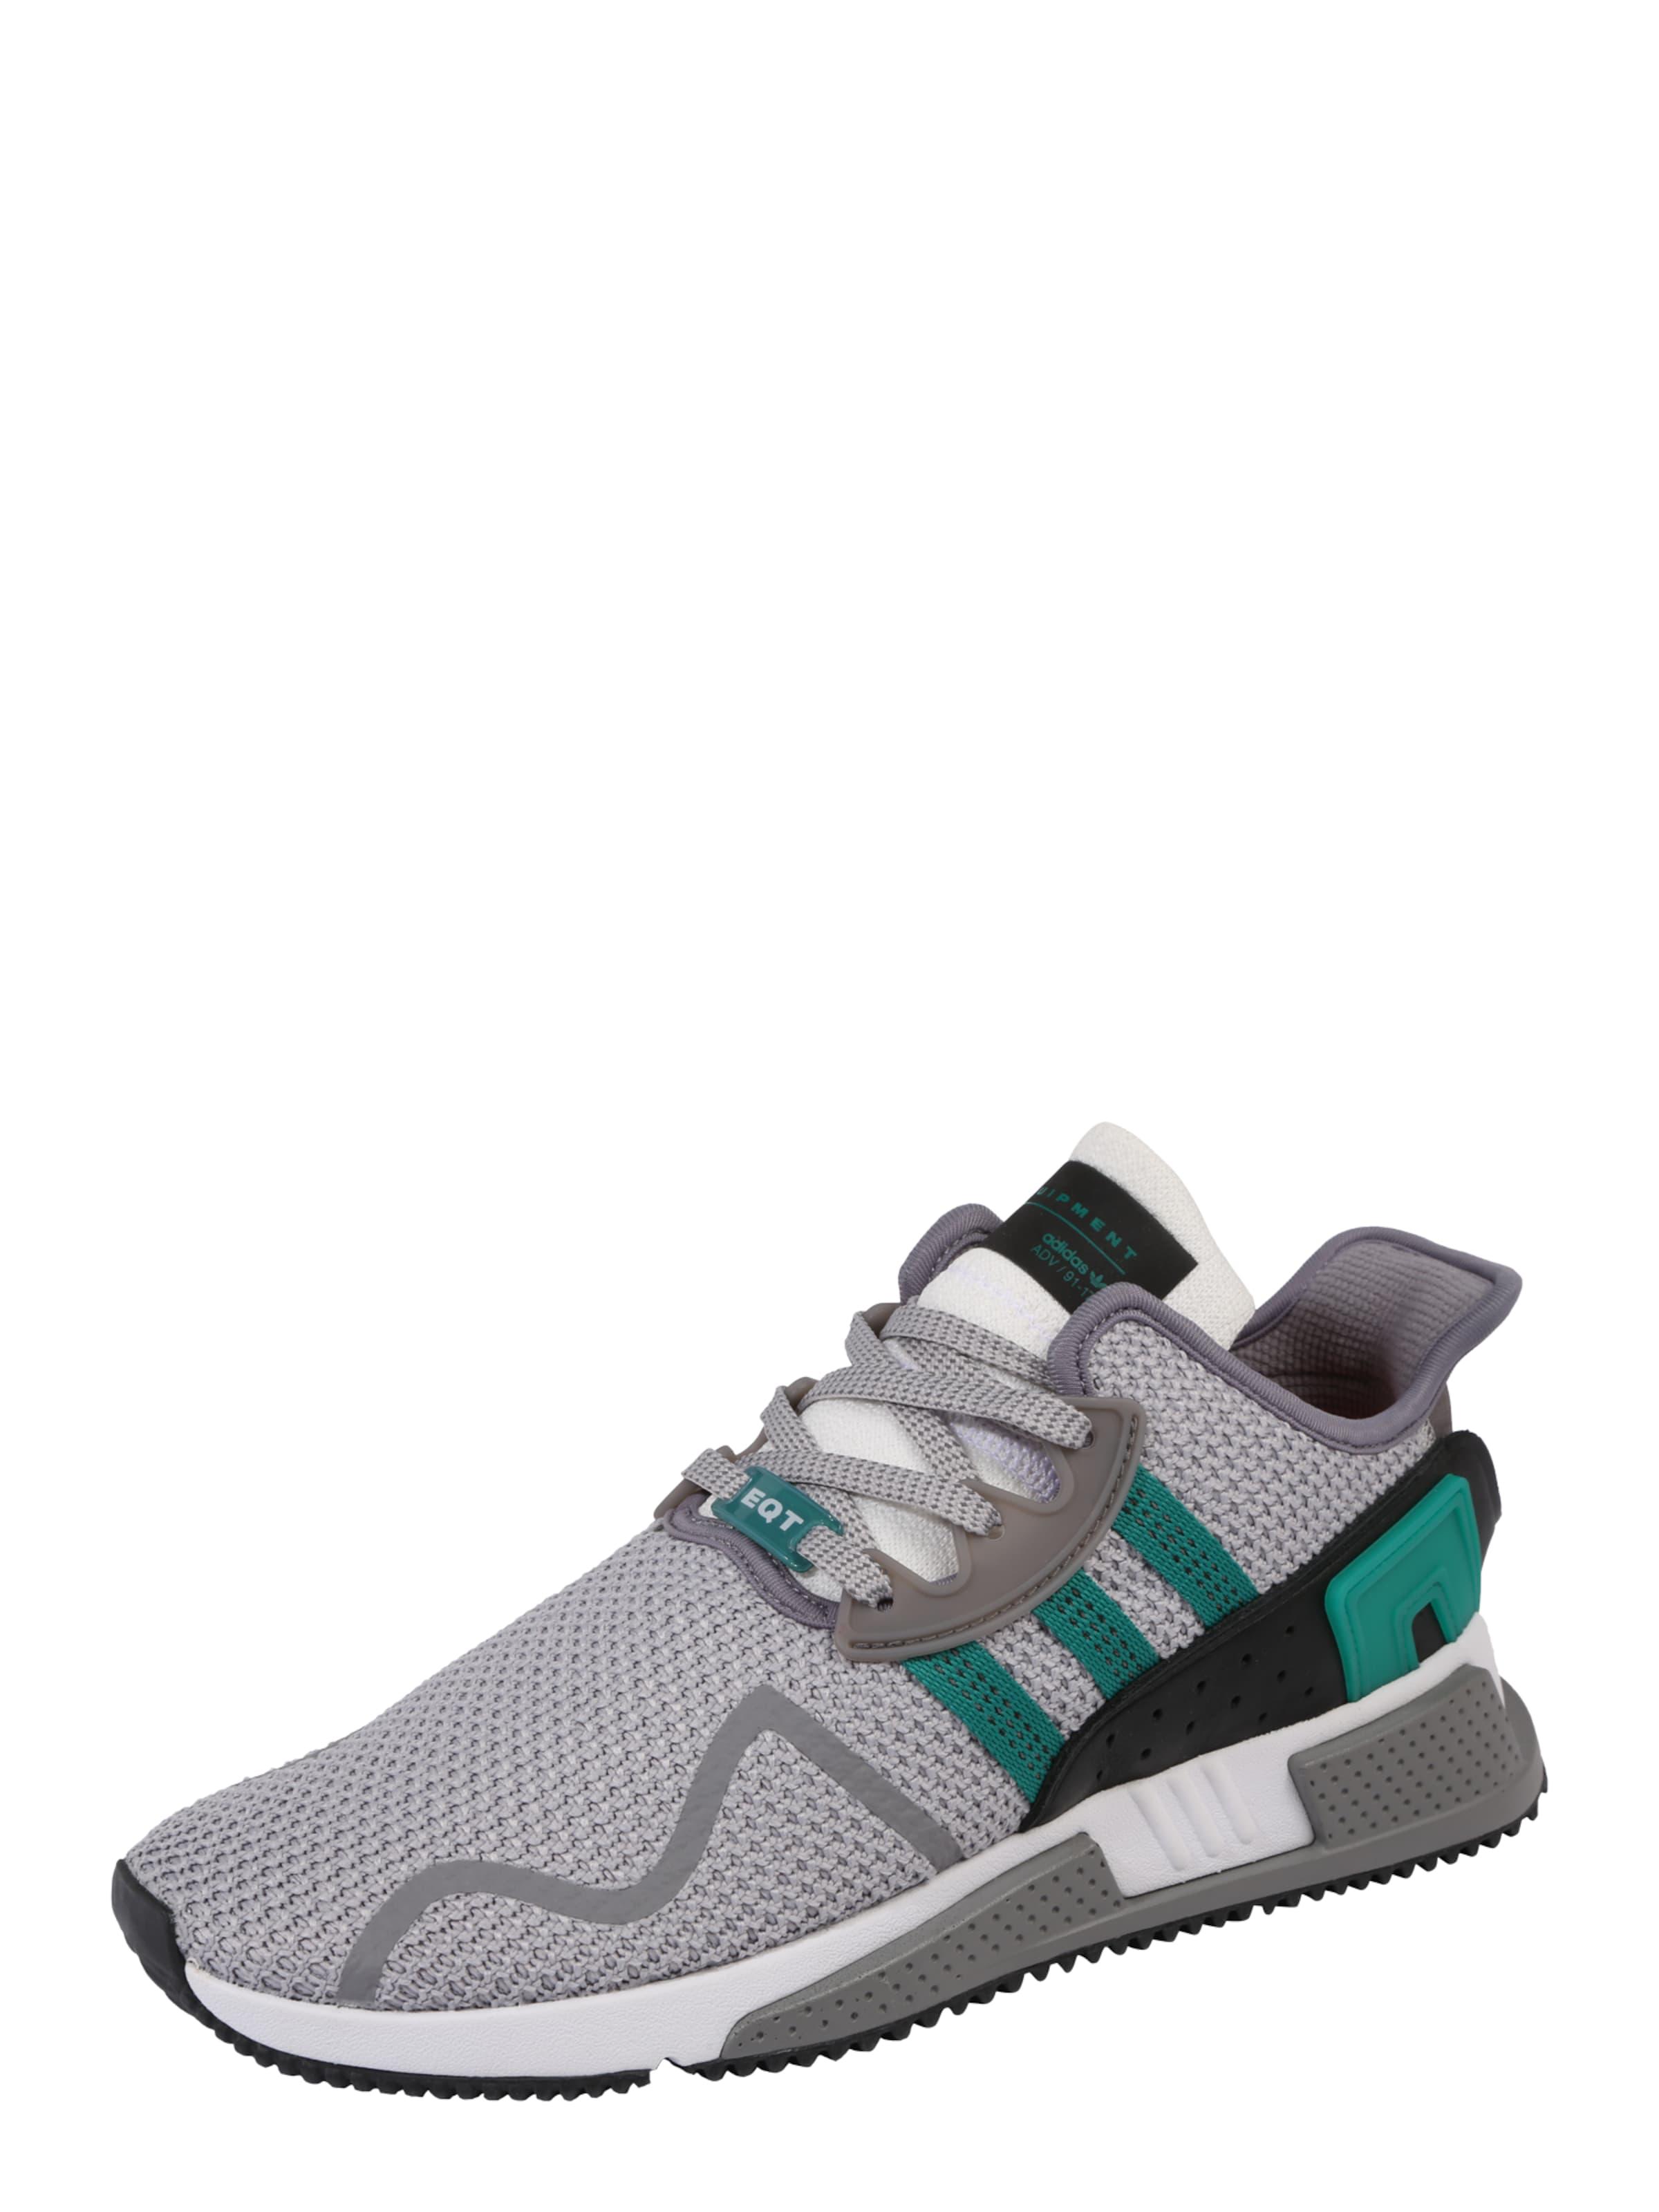 ADIDAS ORIGINALS Sneaker  CUSHION